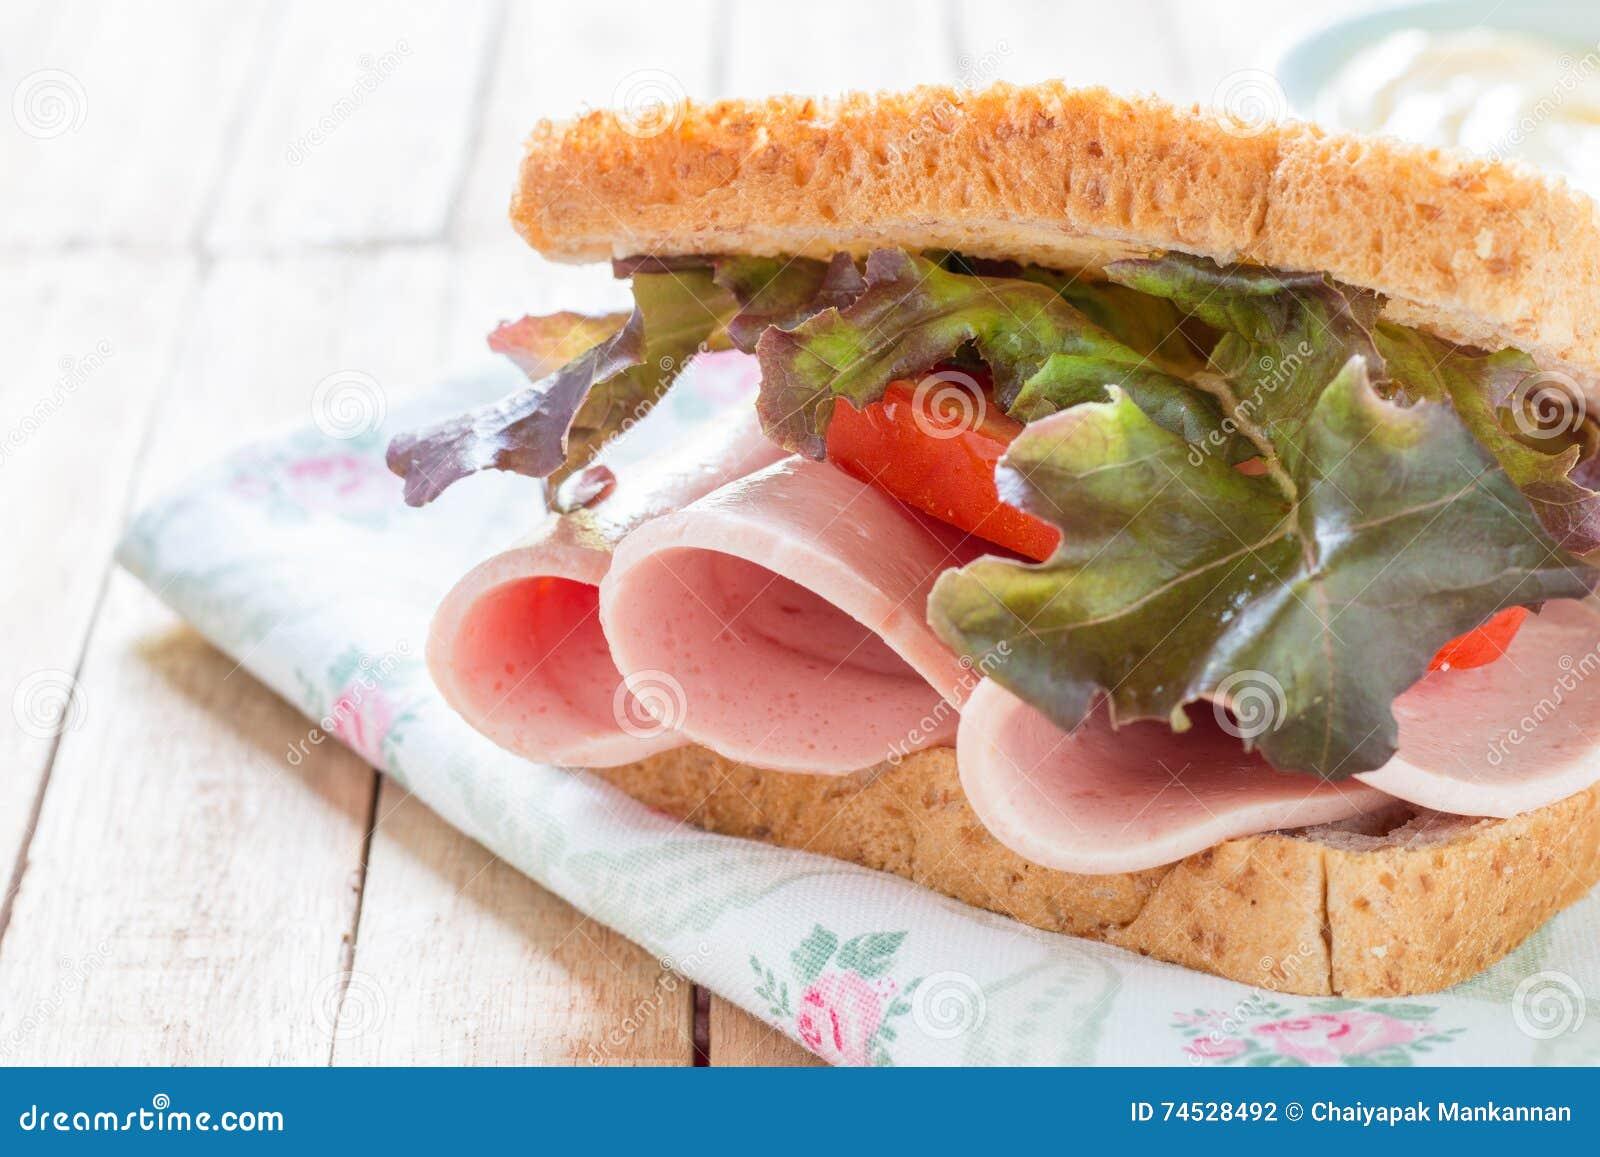 Sandwich bologna sausage stock photo. Image of pork ...